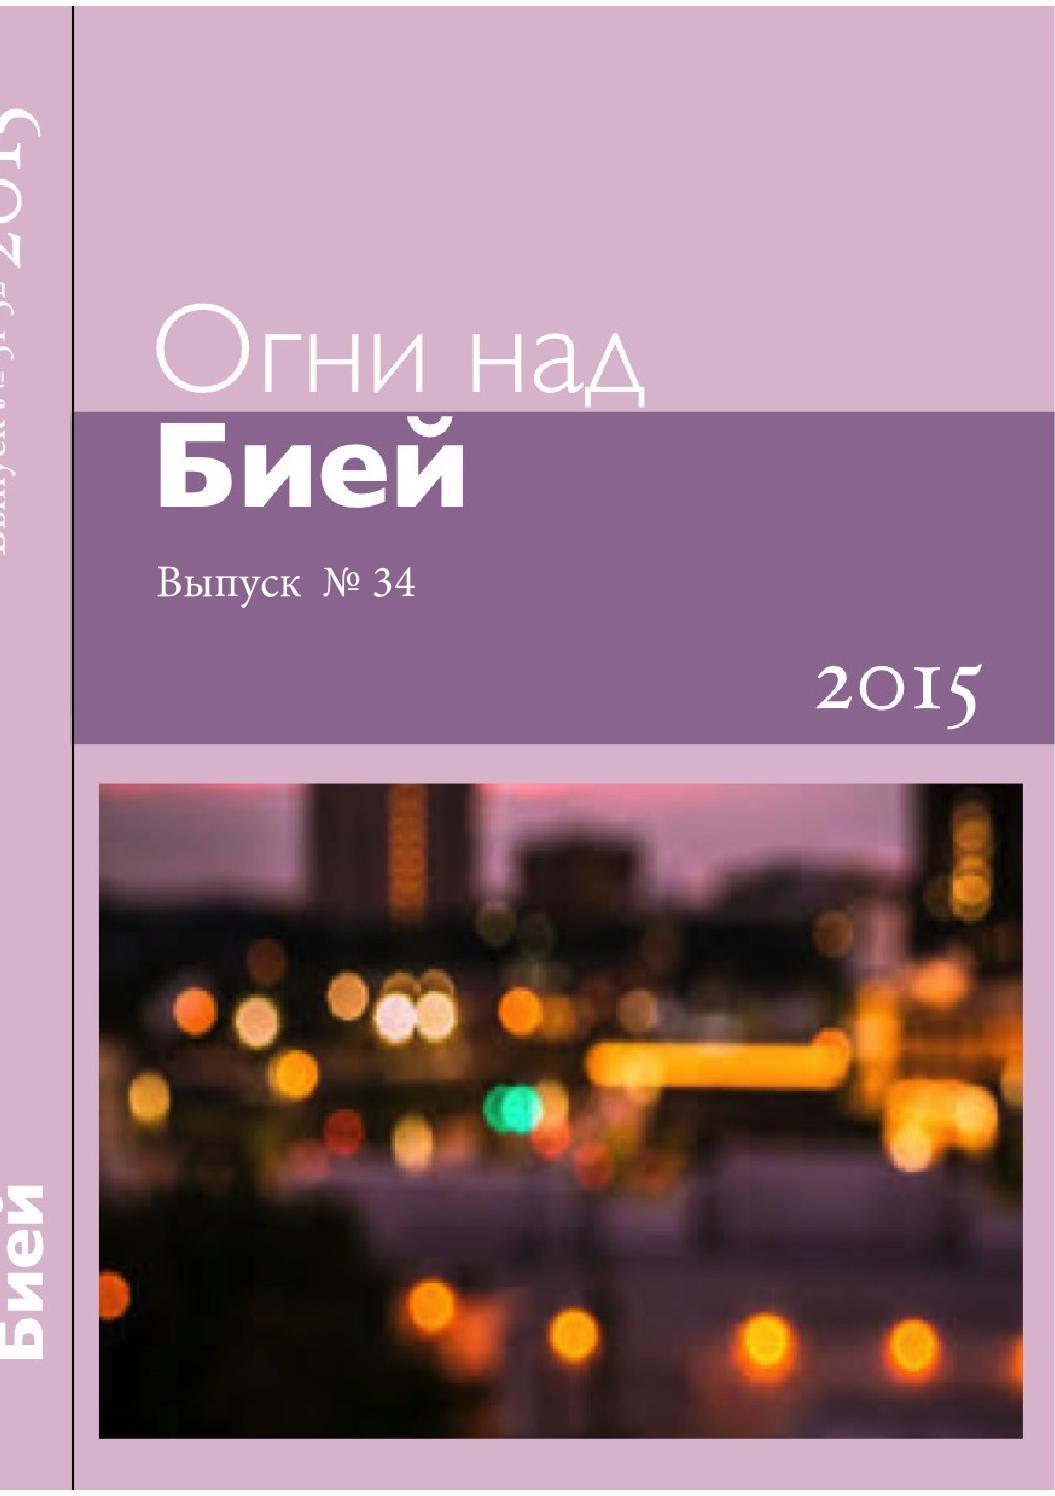 онлайн заявка на кредит во все банки краснодара